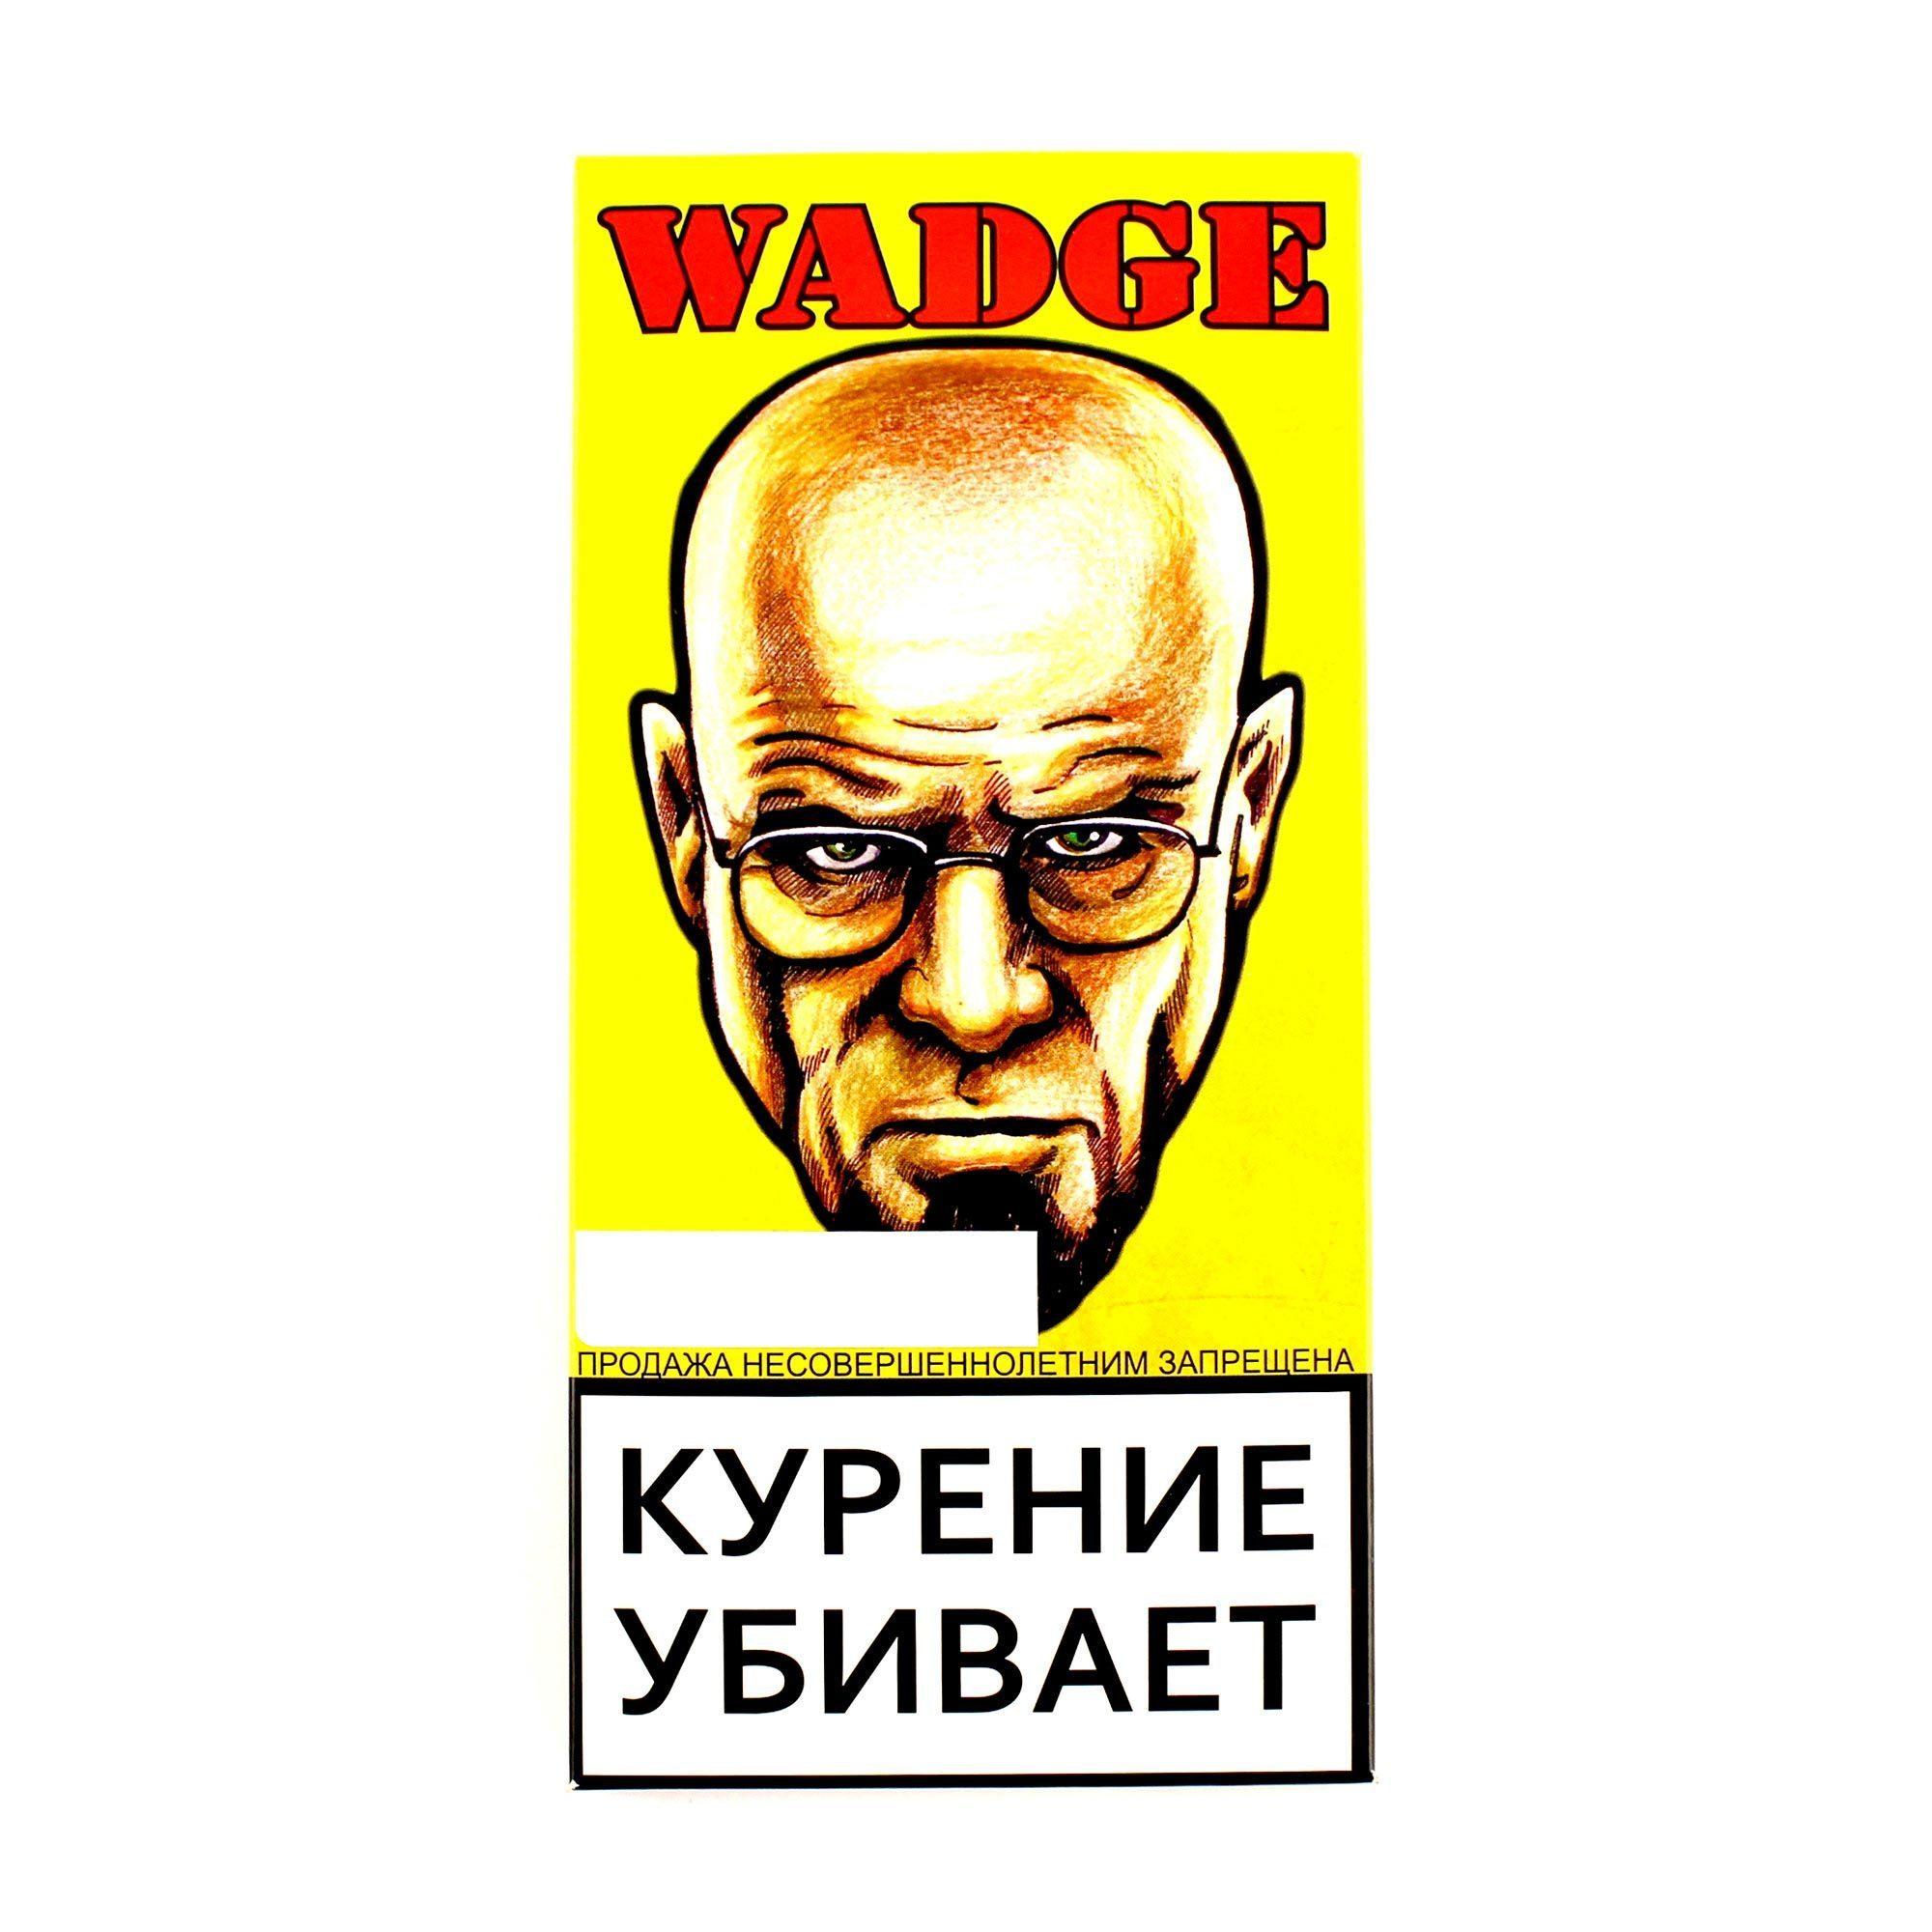 Табак для кальяна WADGE MELDONIUM 200 гр